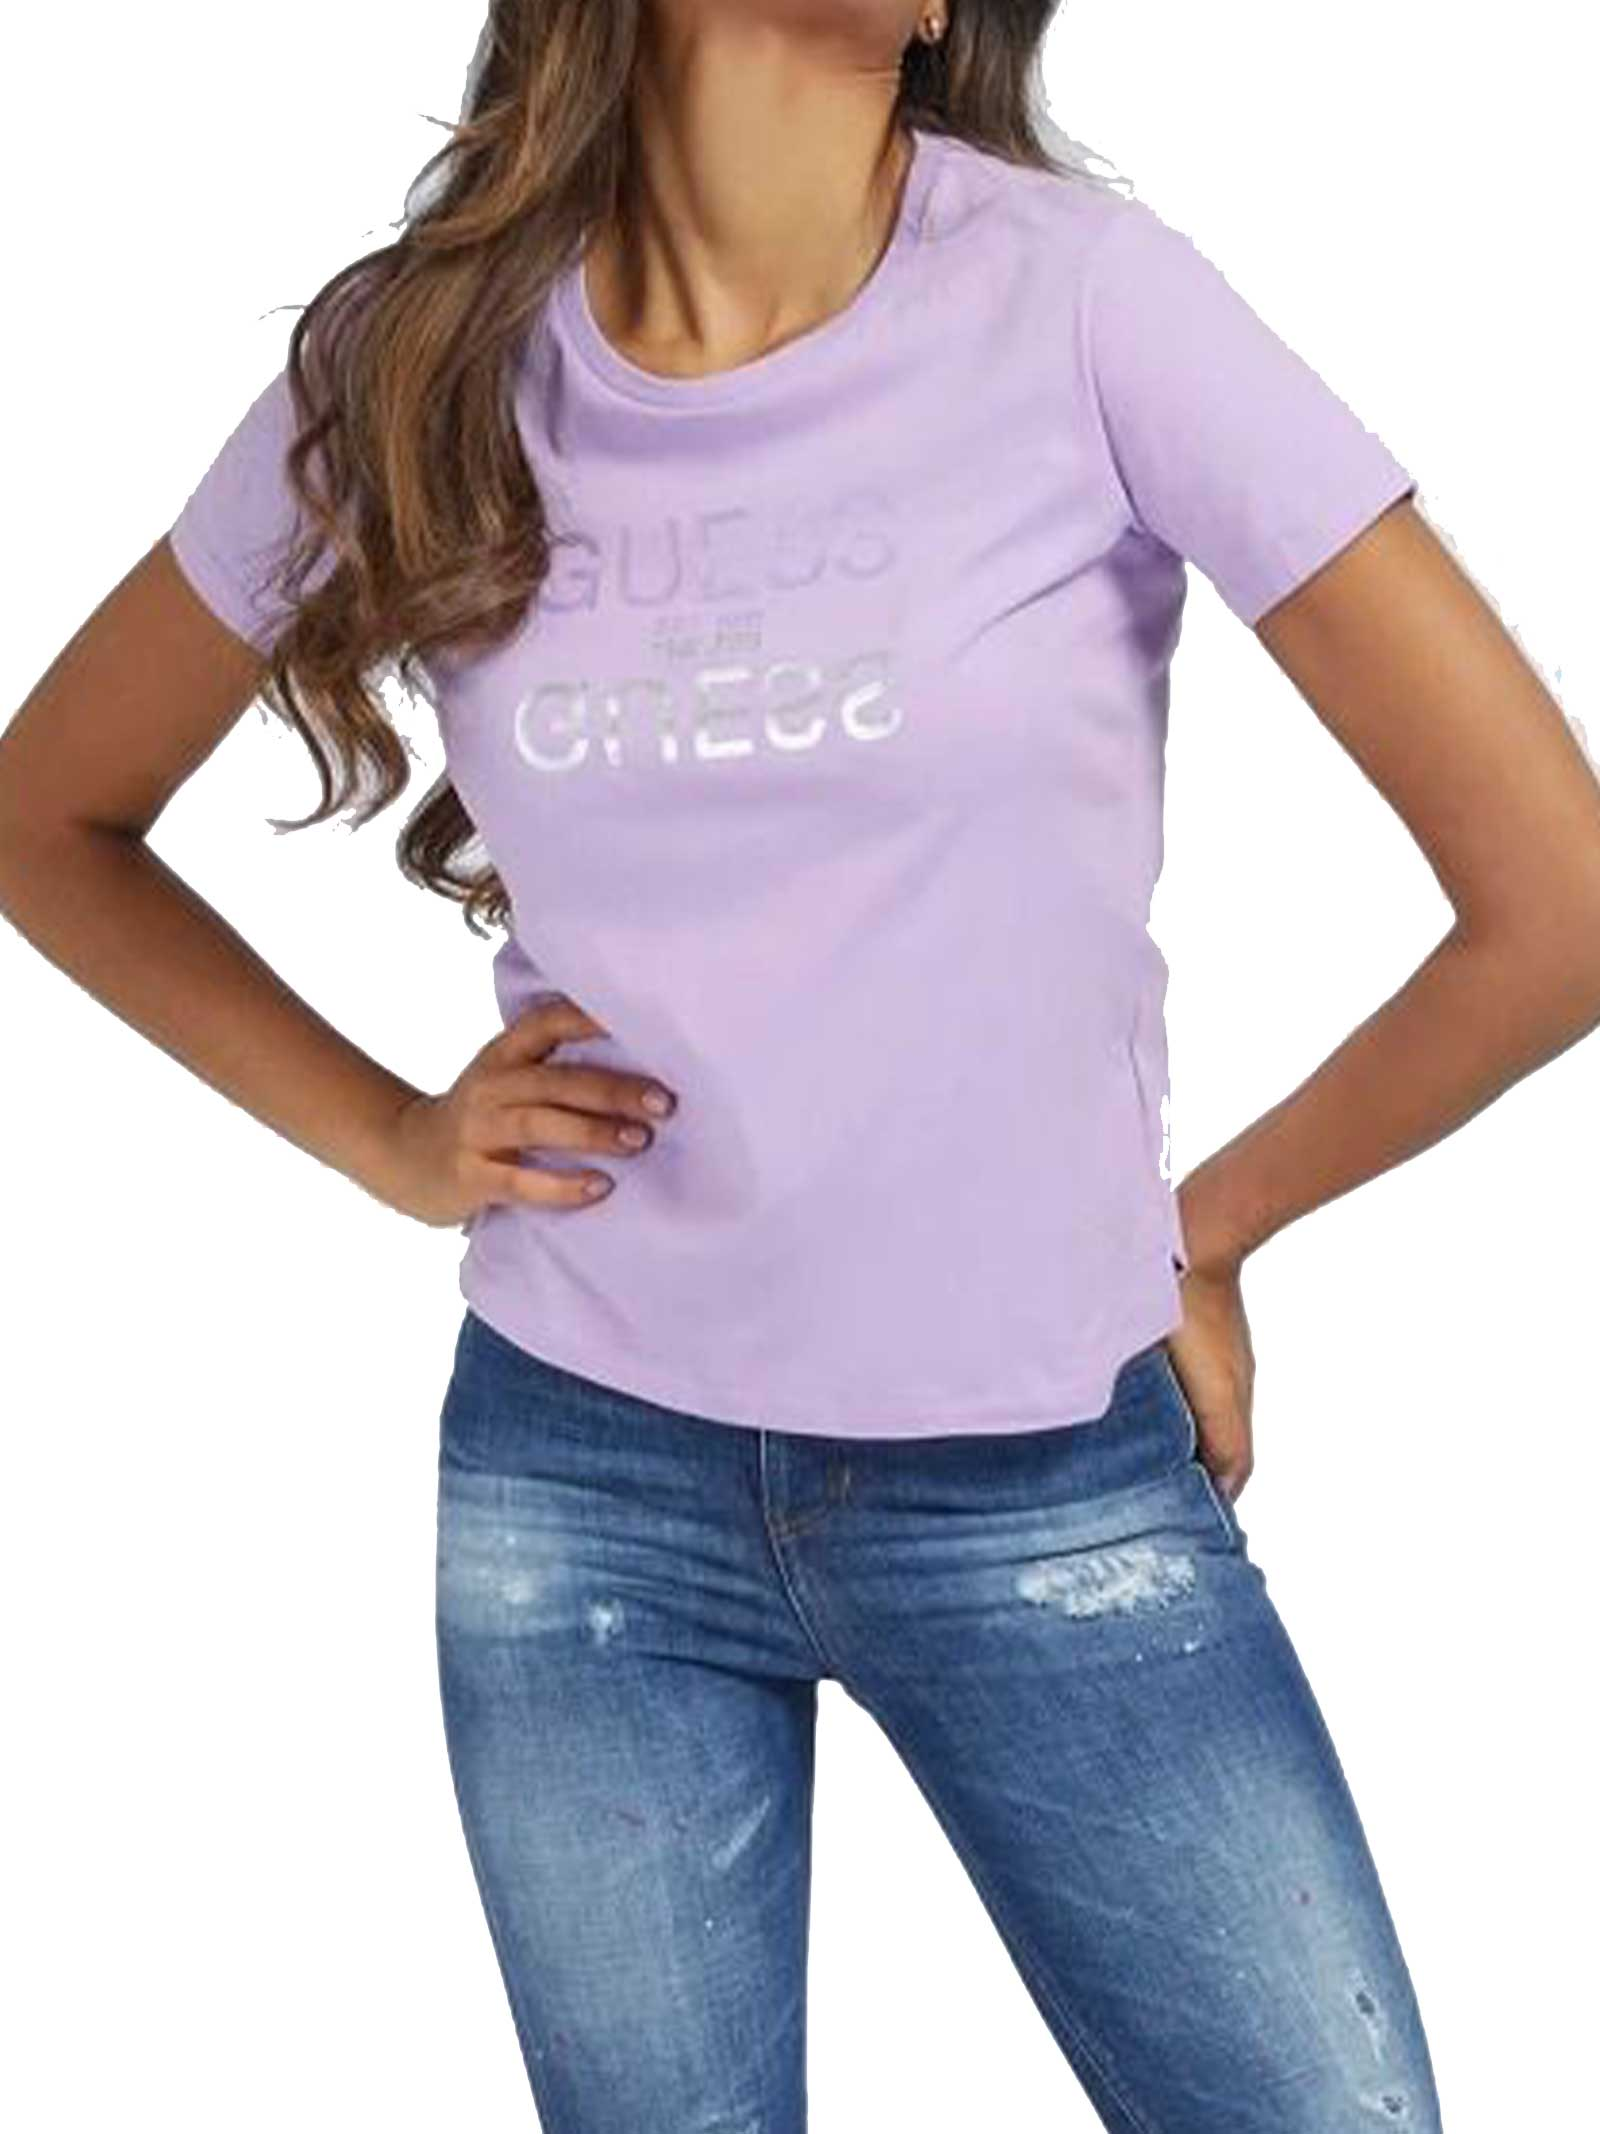 T-SHIRT DONNA GUESS   T-shirt   W1GI0C-I3Z11G4G8